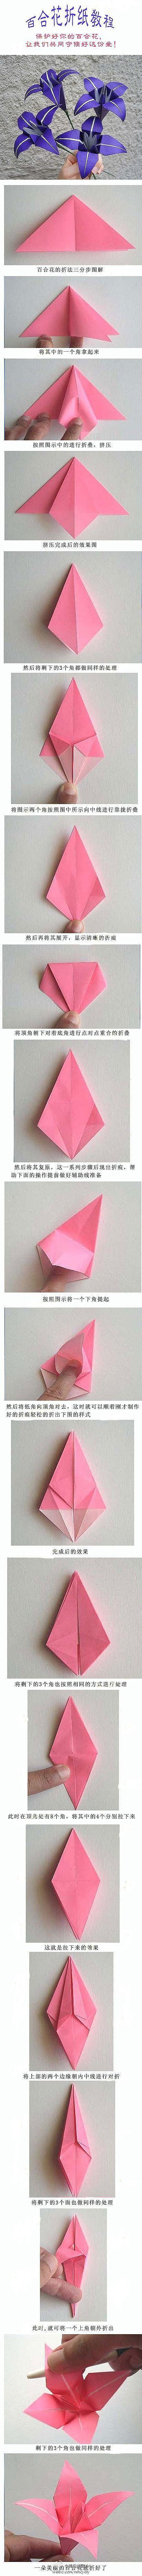 O Artesanal Diy Origami Lrios Tutorial Origami Diy Pinterest